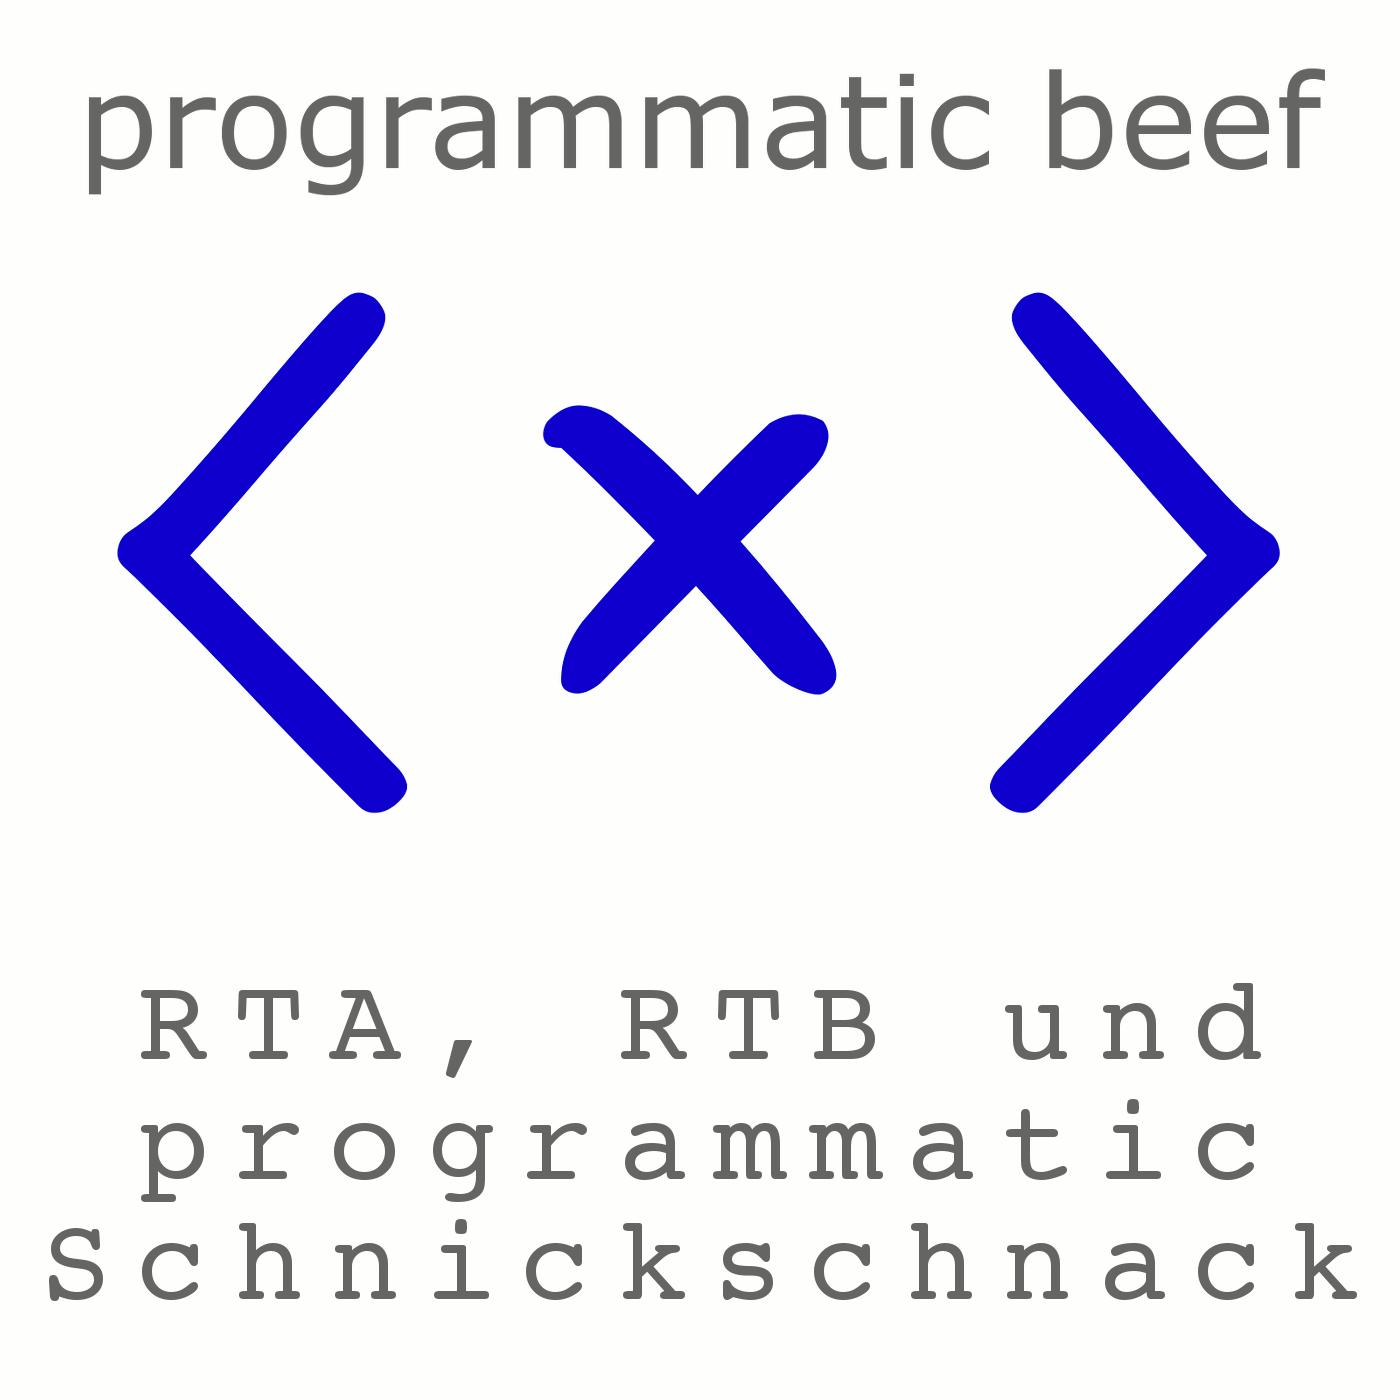 programmatic beef